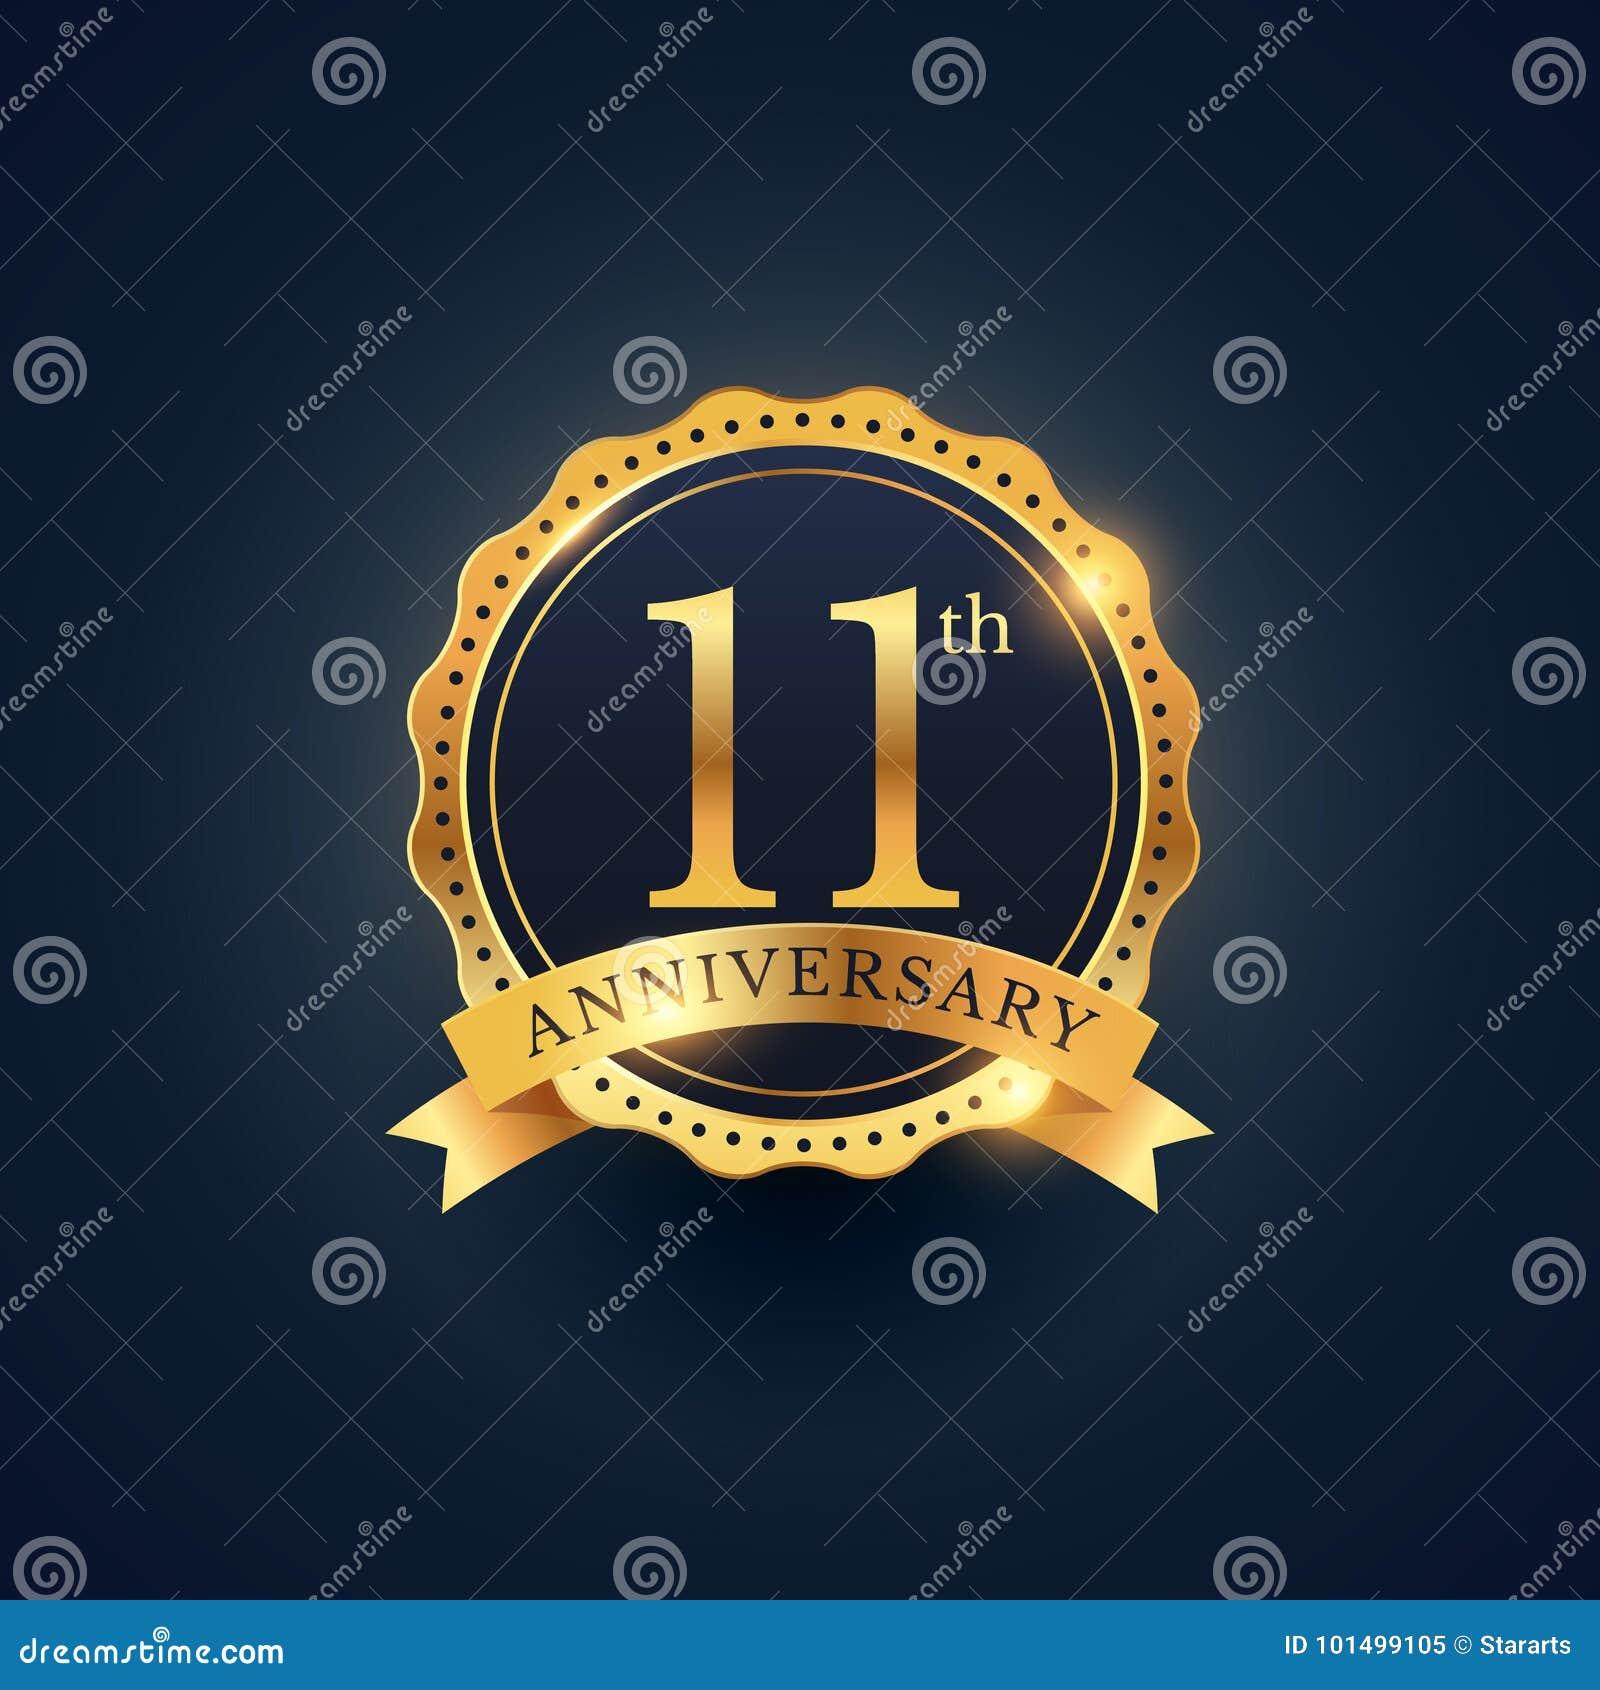 11th Anniversary Celebration Badge Label In Golden Color